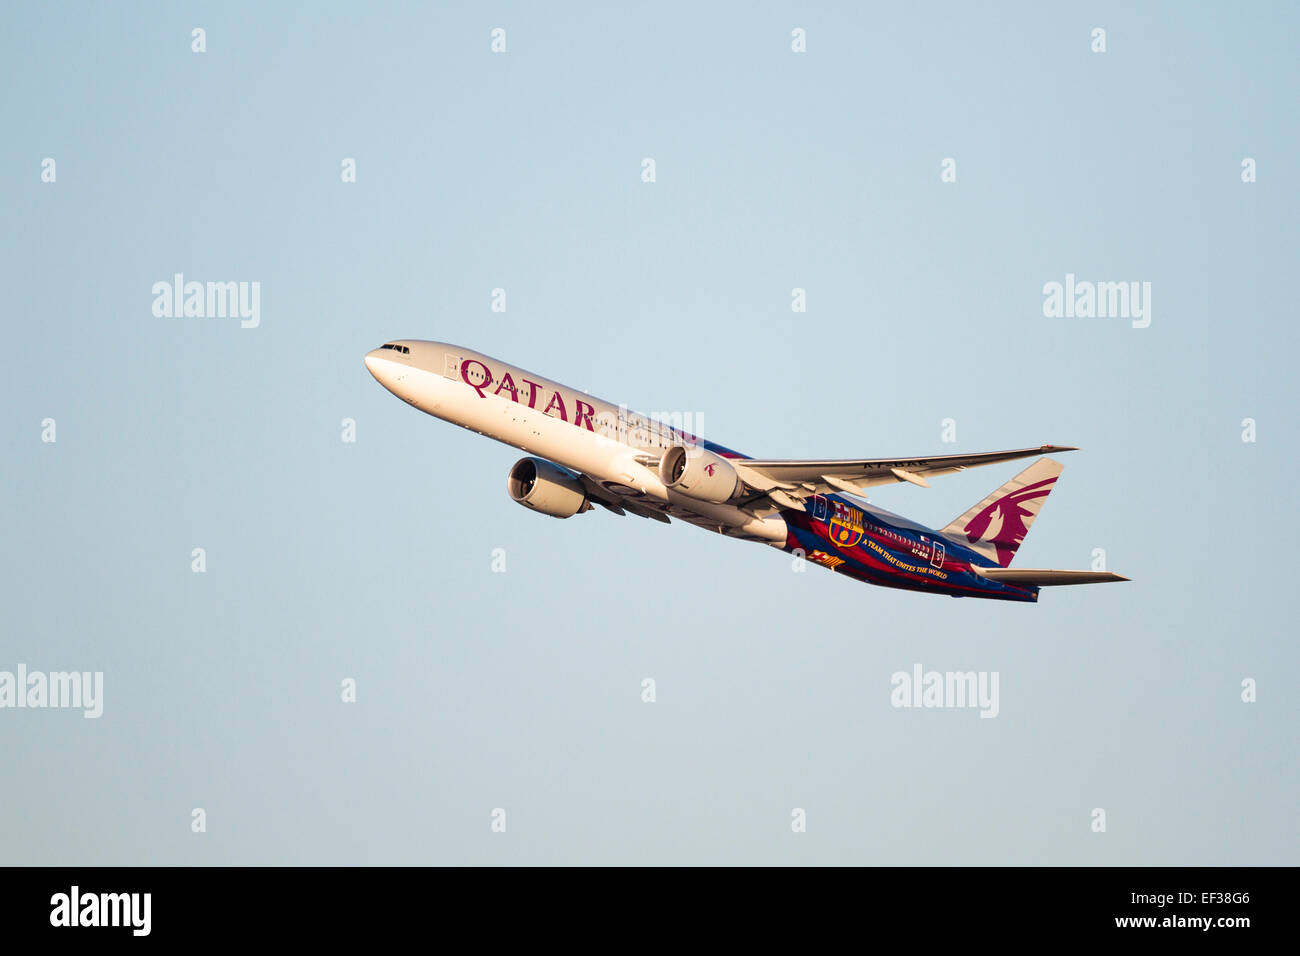 A7-BAE Qatar Airways Boeing 777-3DZ/ER,FC Barcelona livery, Surrey, England, UK - Stock Image